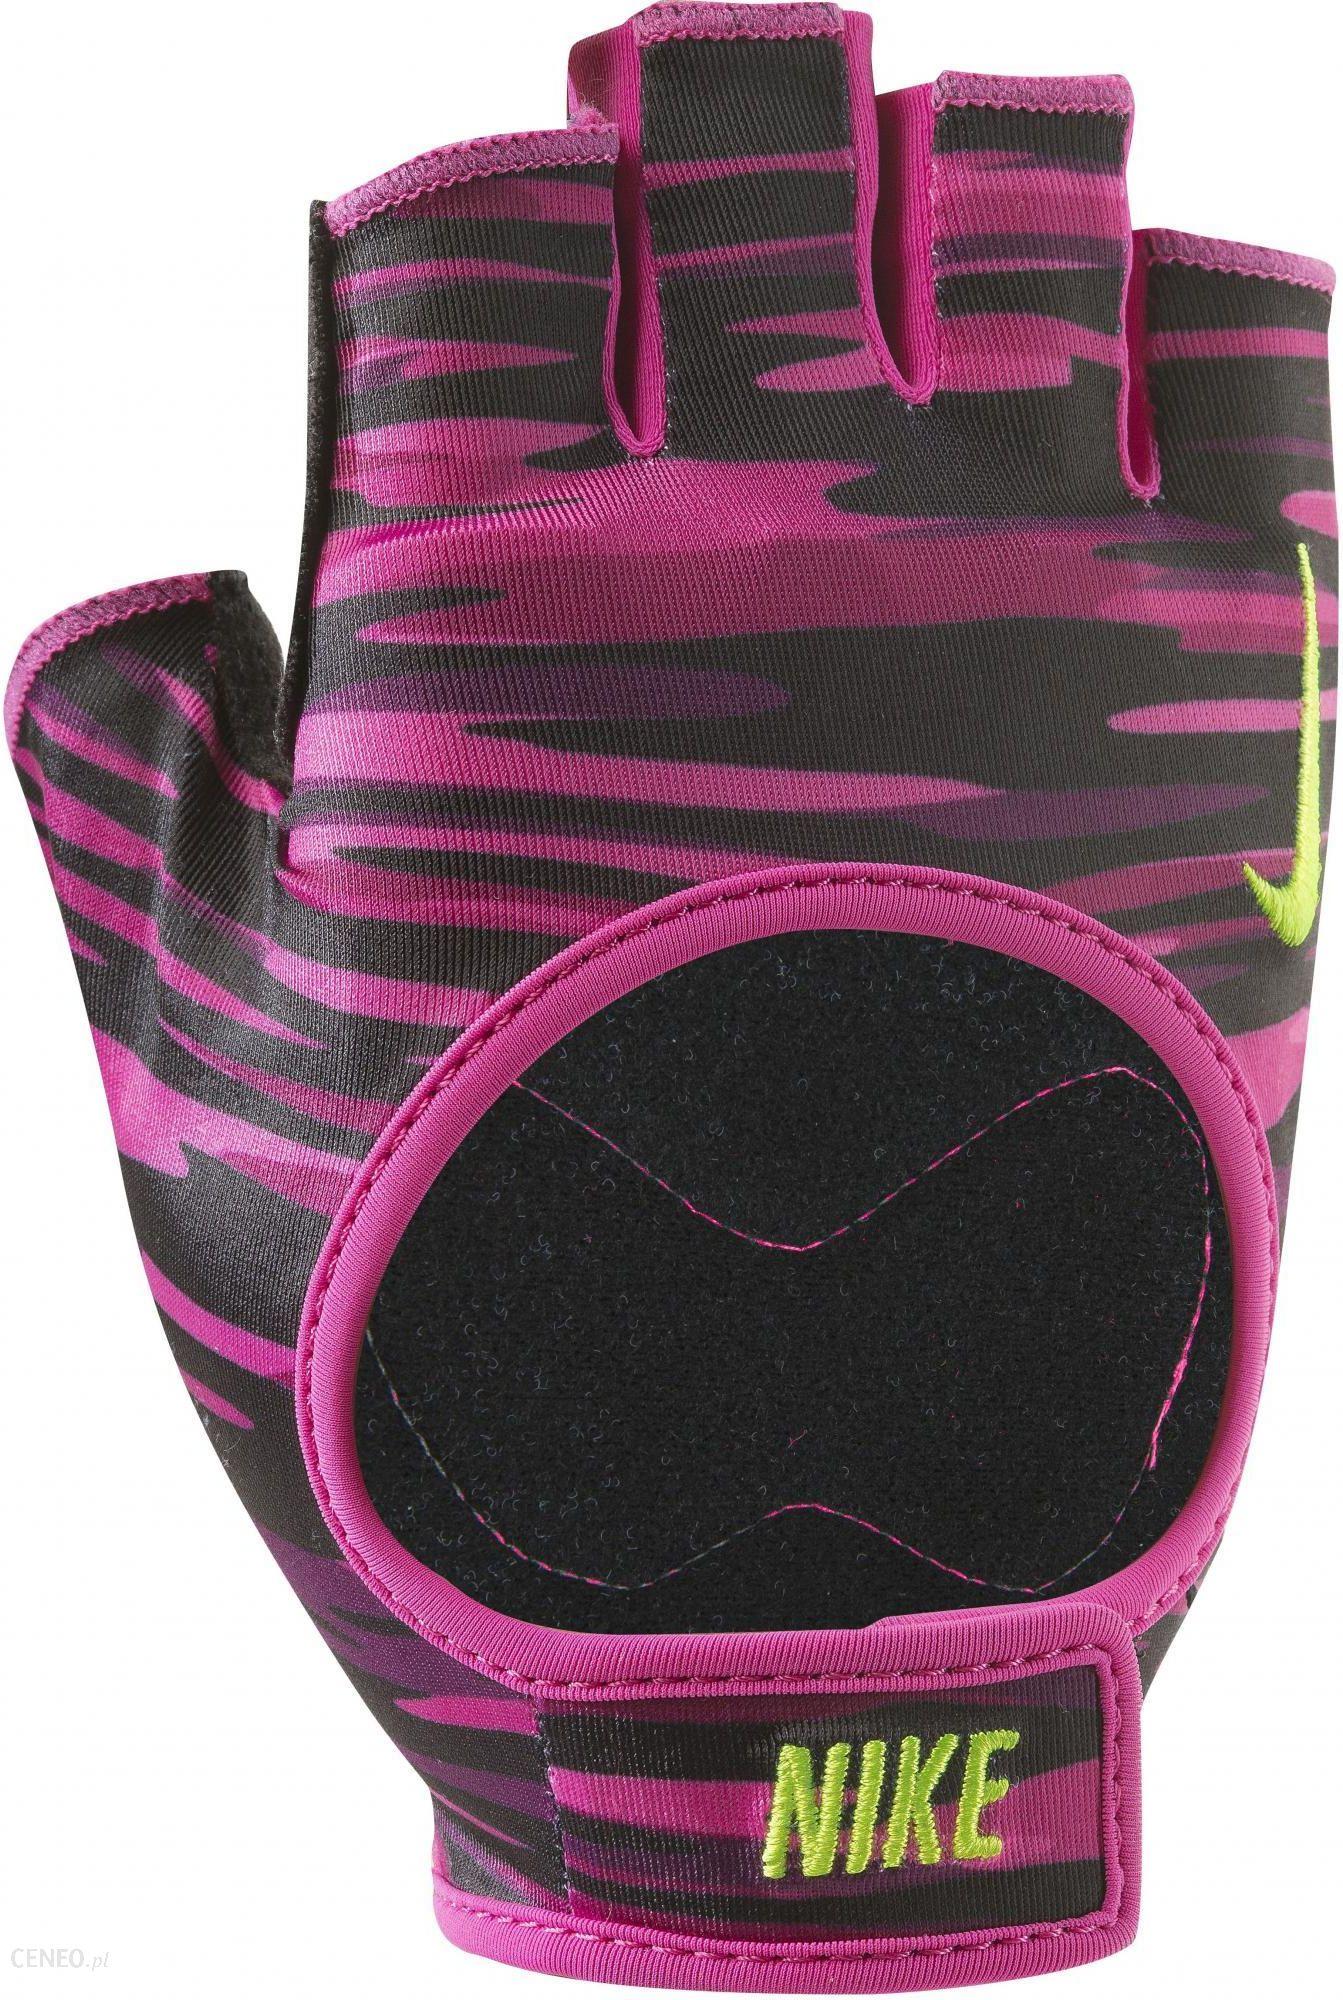 Nike Women Essential Fitness Gym Gloves Women's training